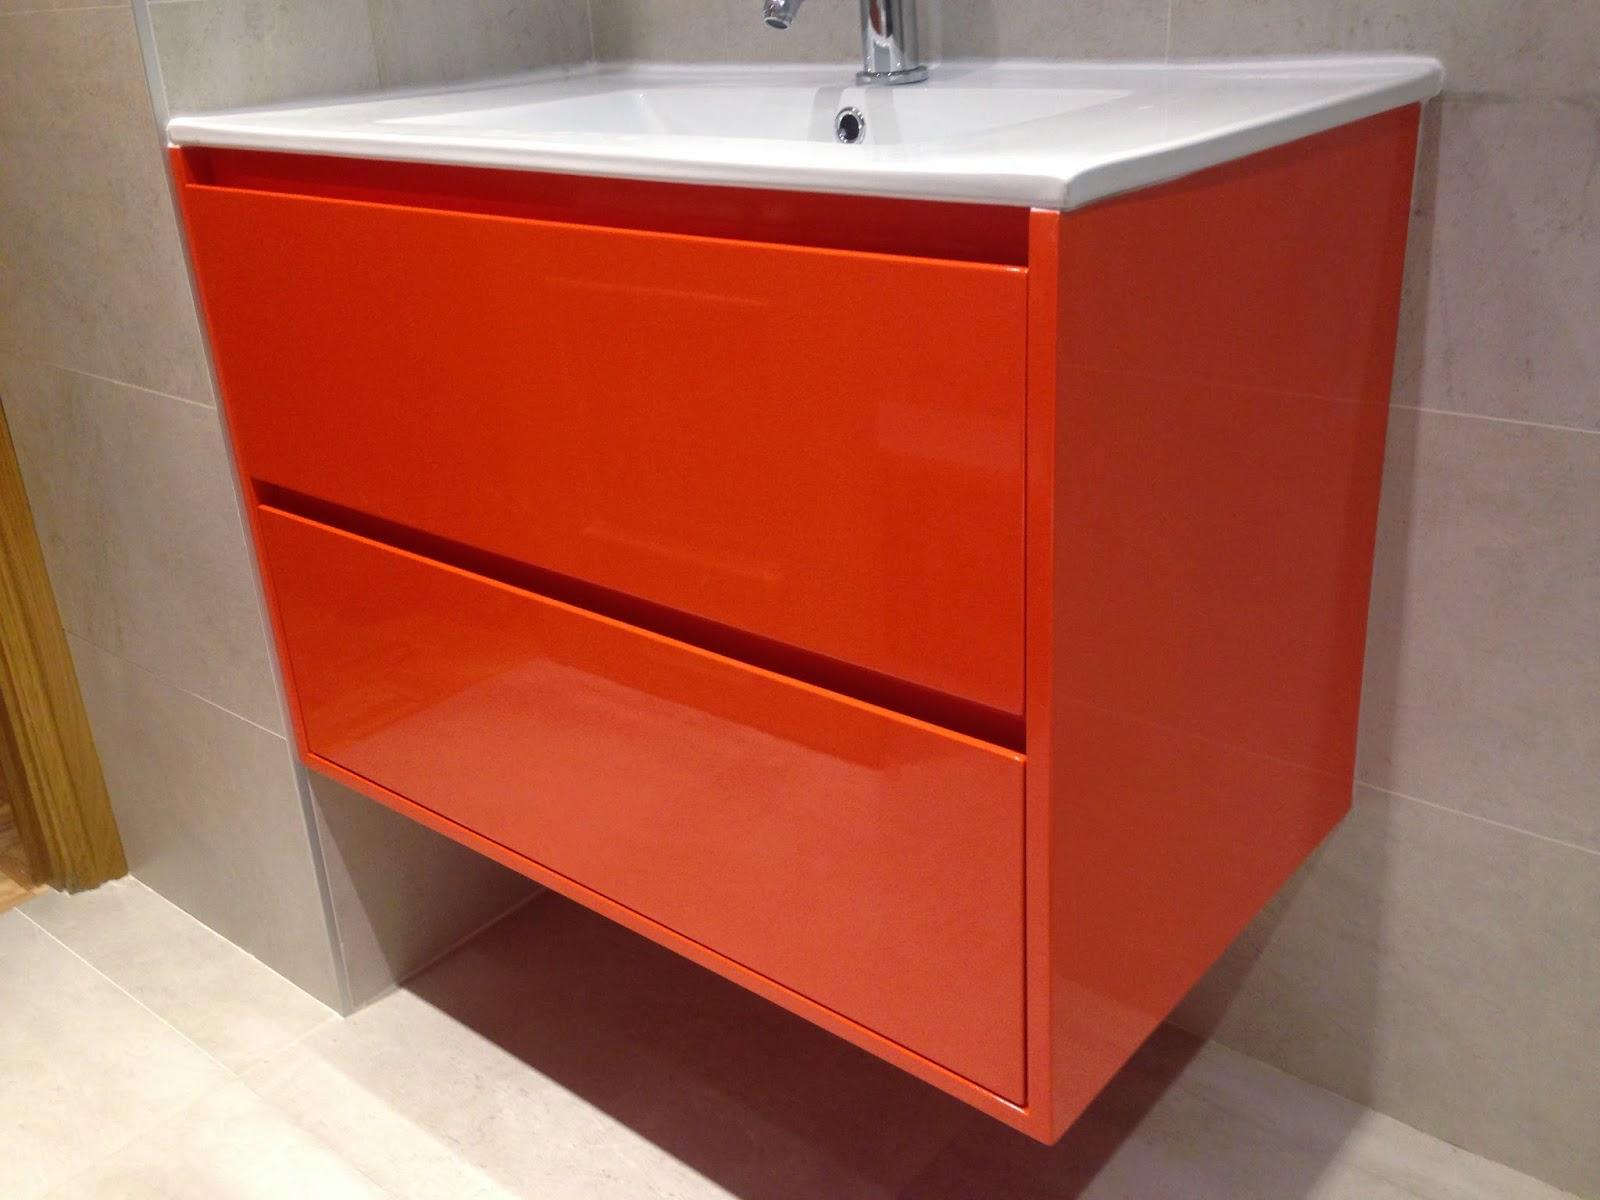 Muebles De Bano Naranja.Pagoa Carpinteria Zurgindegia